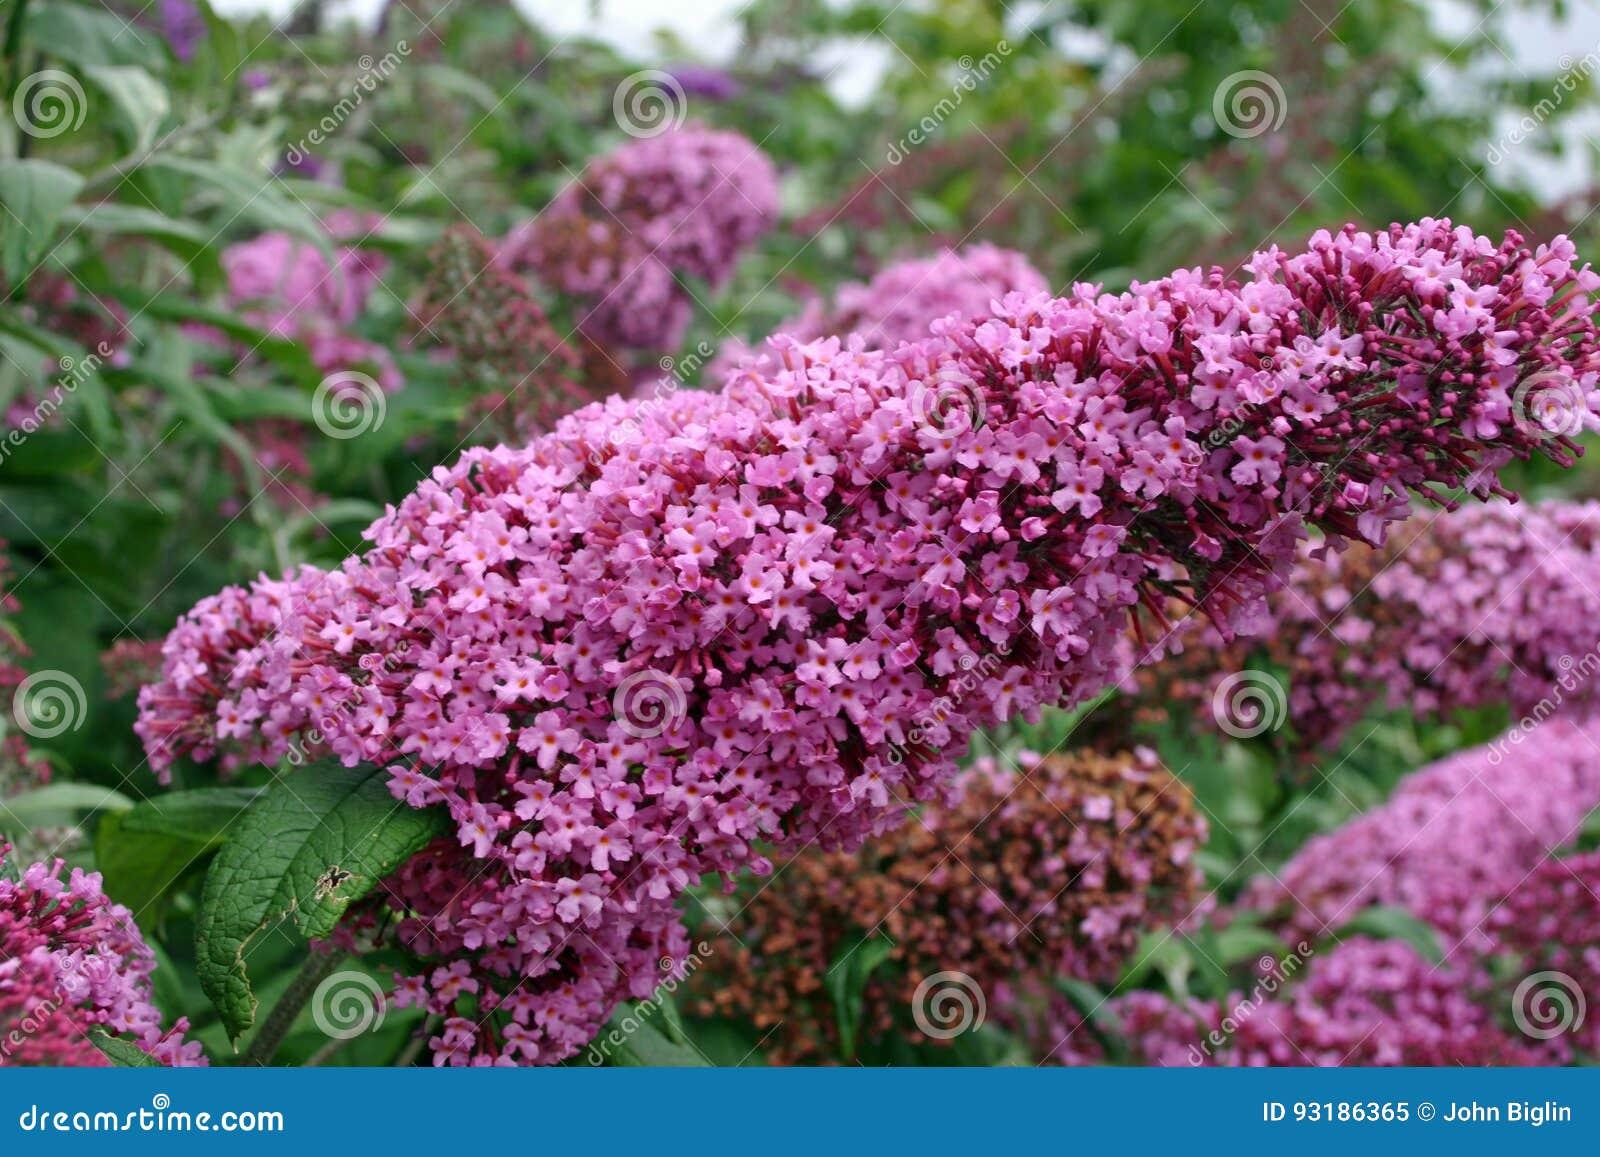 Pink Buddleia Flower Stock Image Image Of Pink Spike 93186365